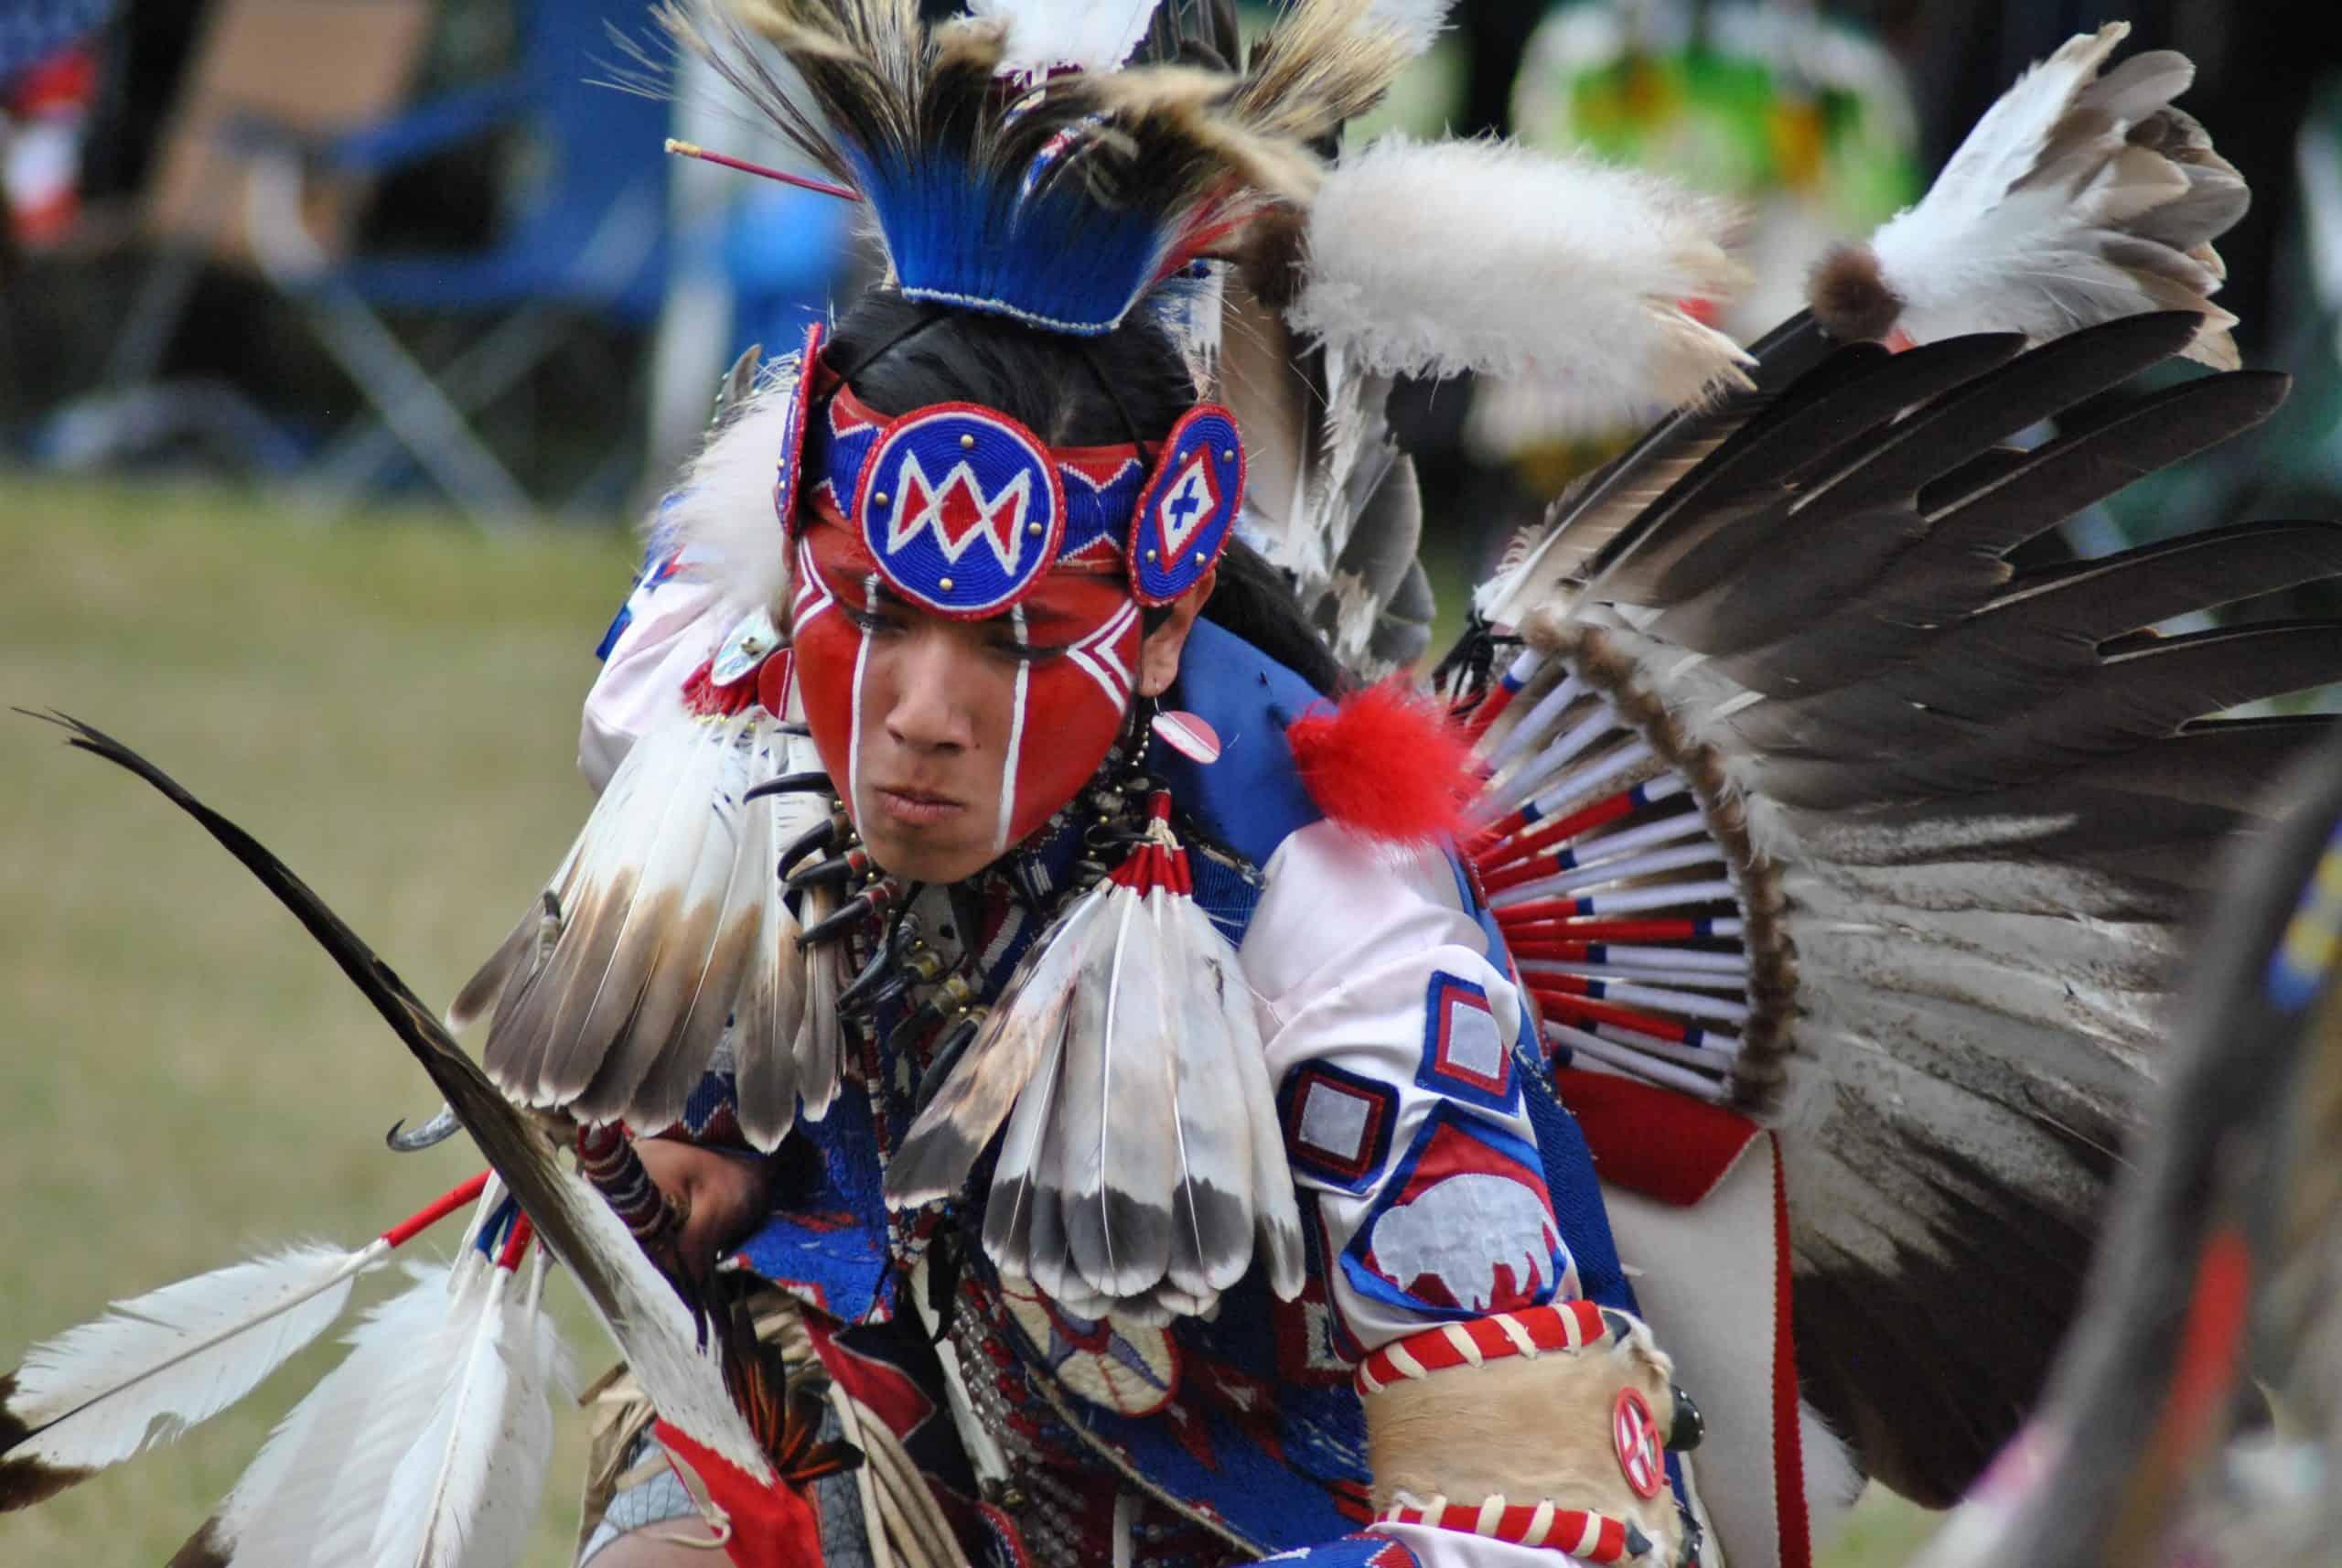 Native American pow wow dancer.